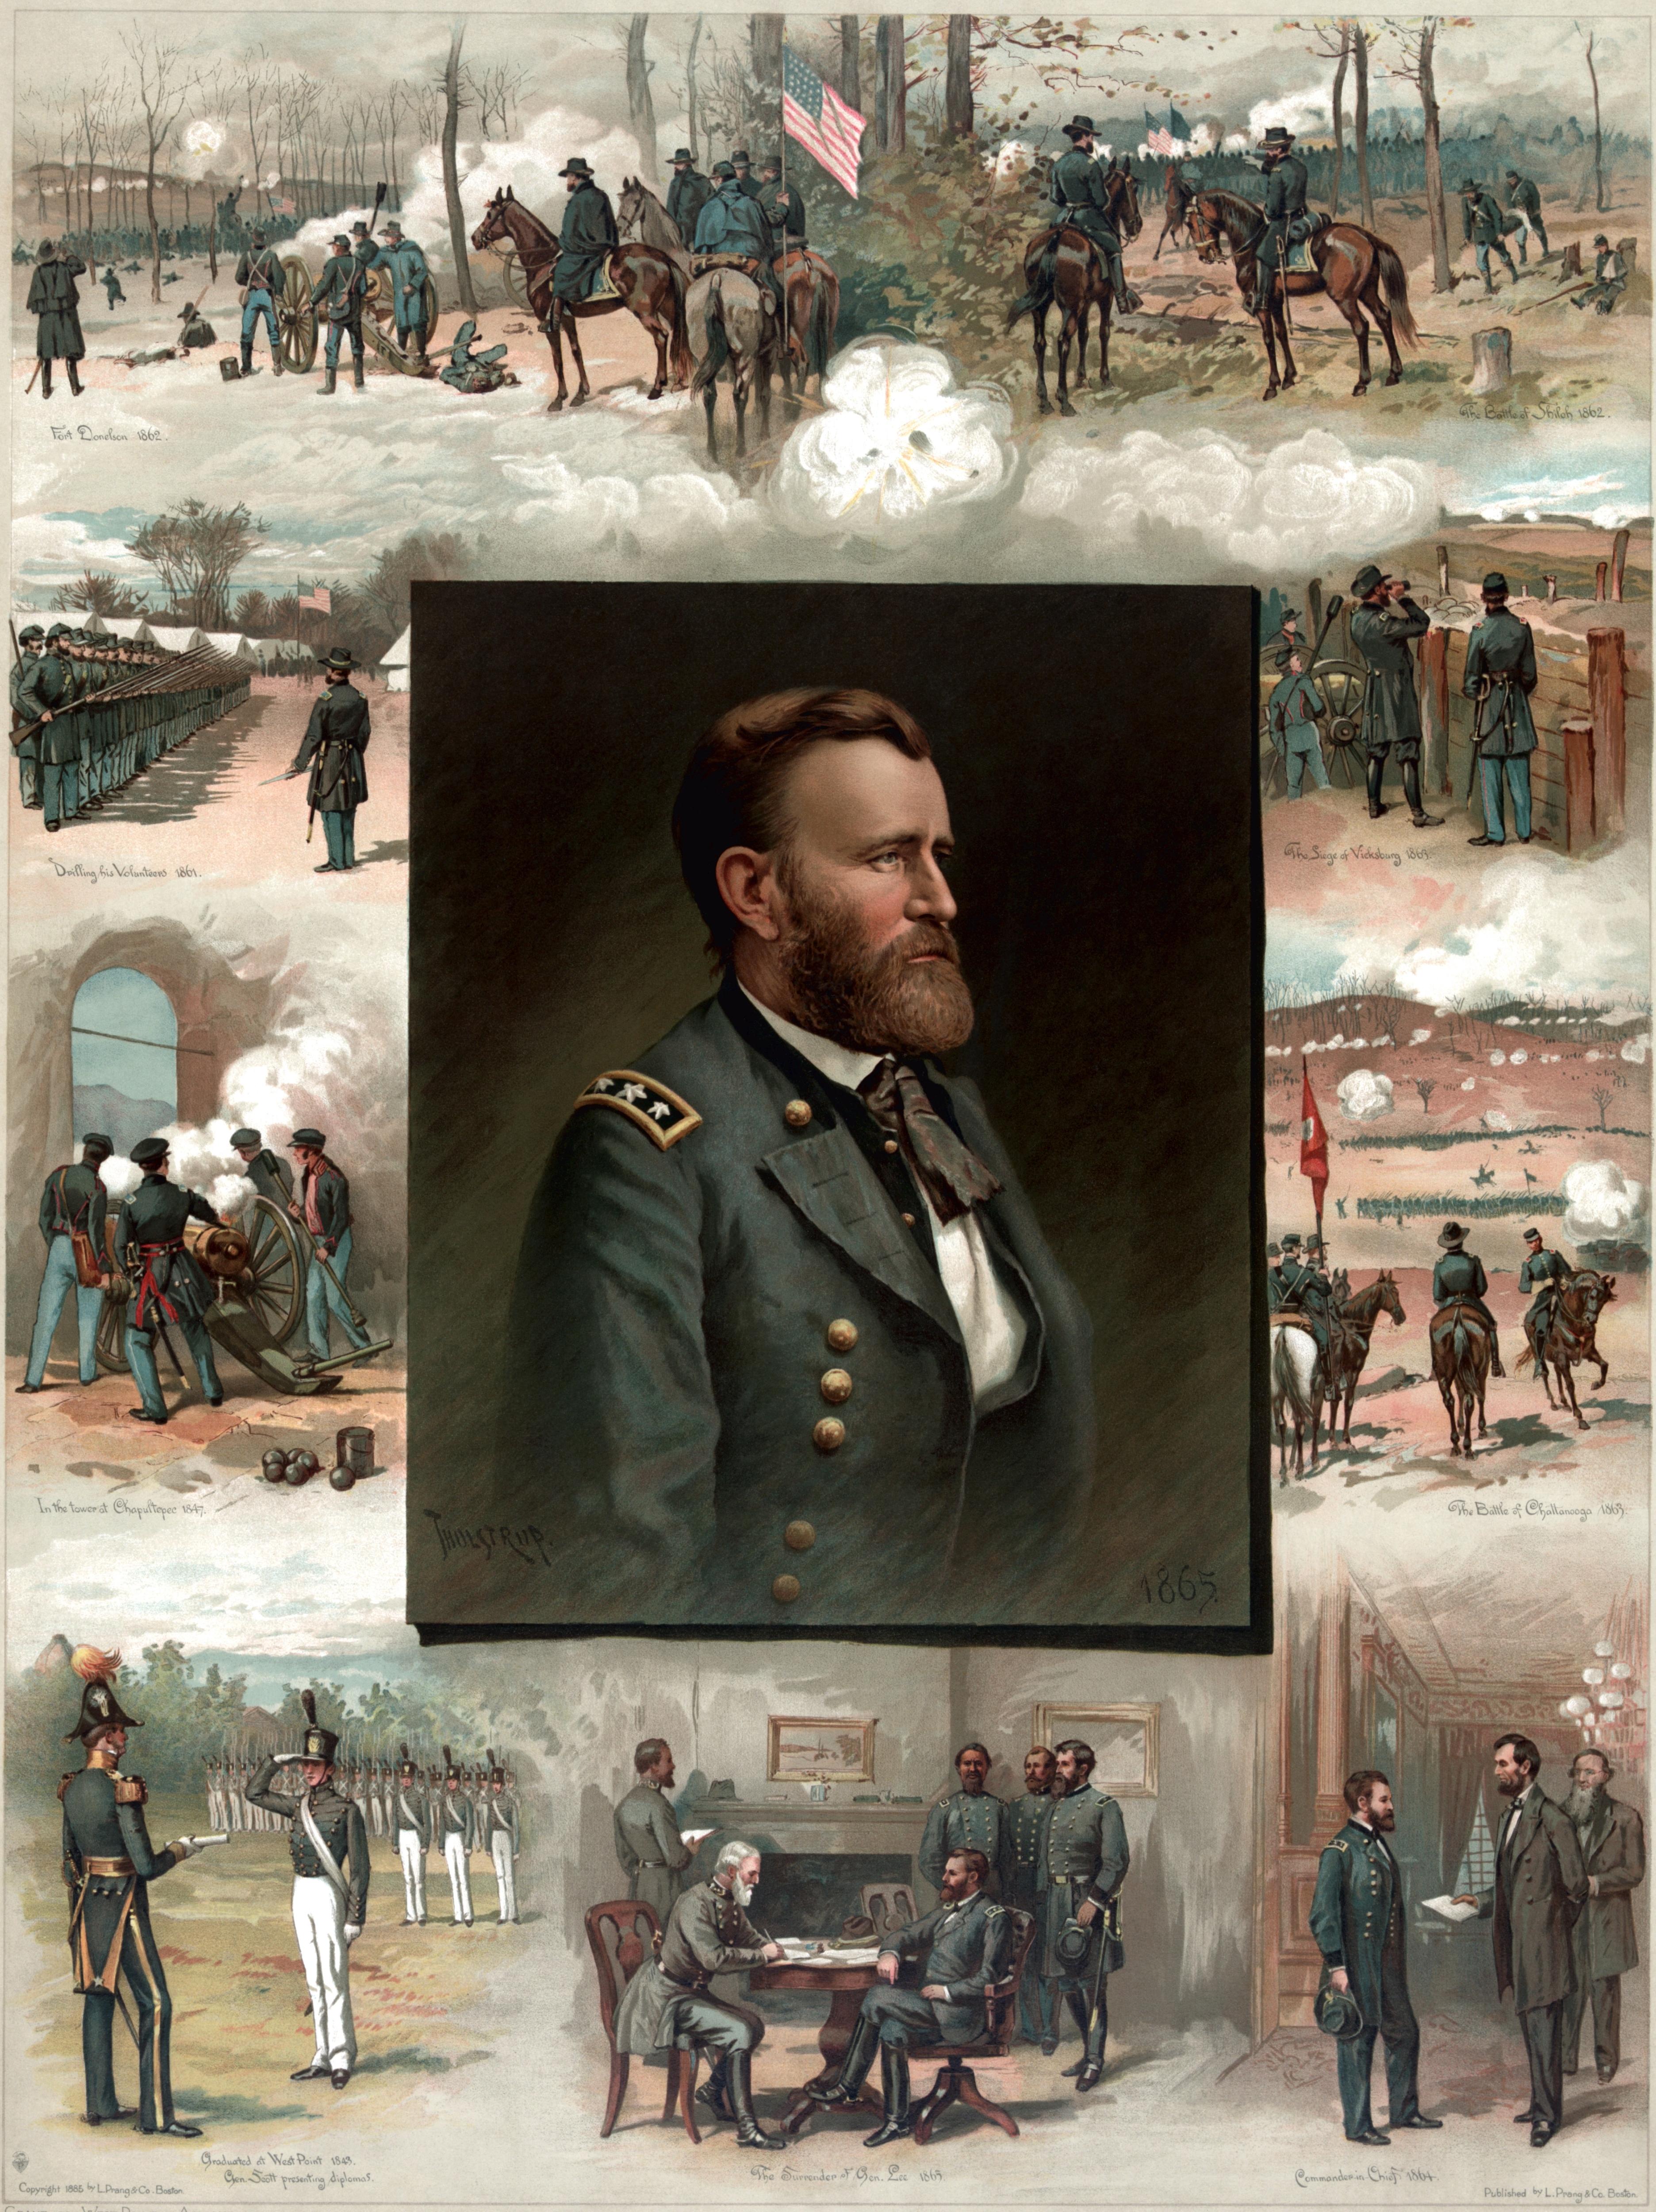 Тур де Тулструп. Улисс Грант от Вест-Пойнта до Аппоматокса. 1885